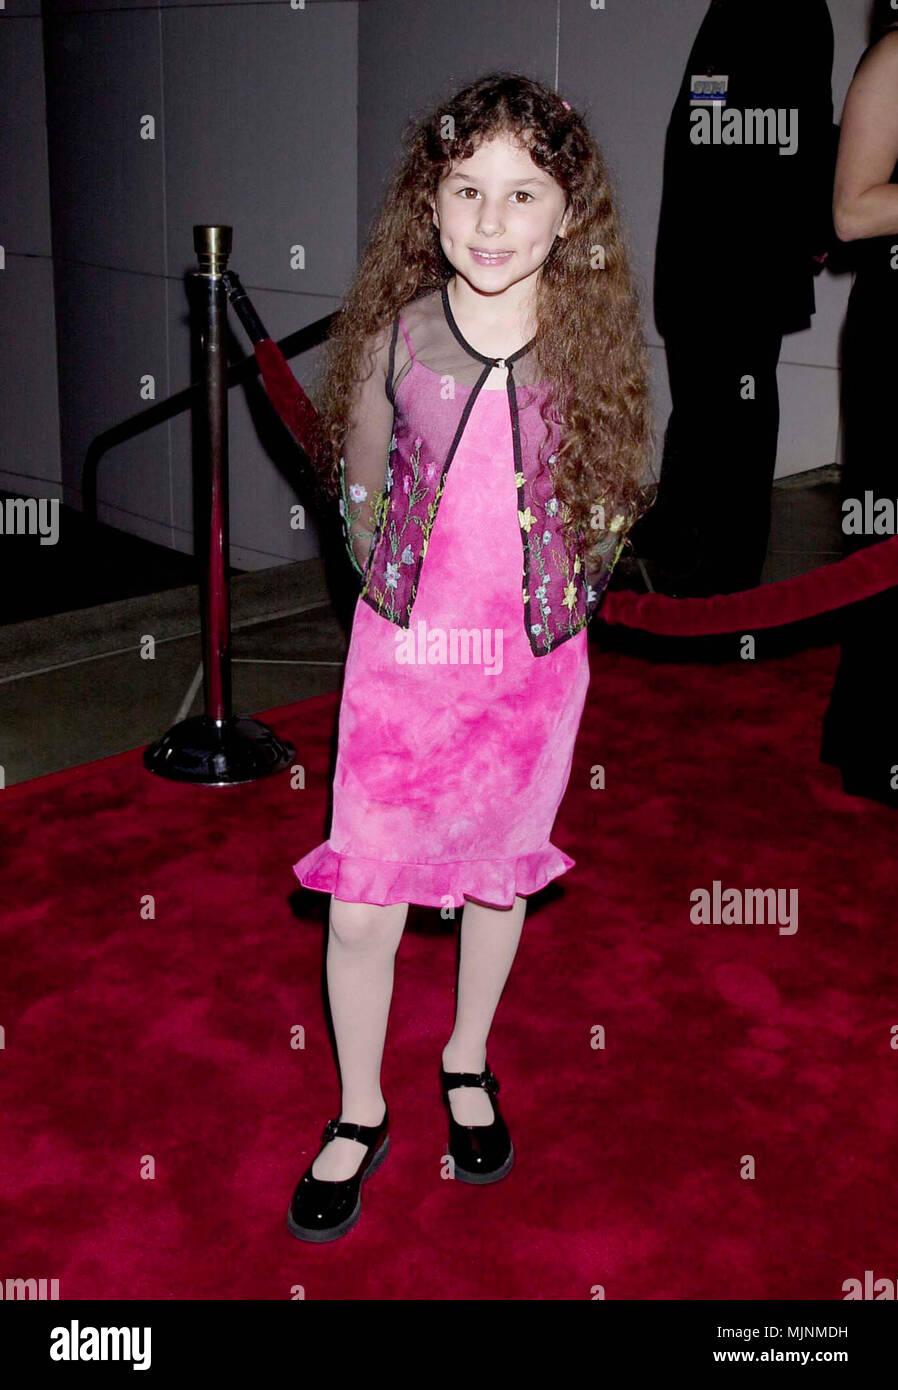 25 Sep 2000, Los Angeles, California, USA --- Hallie Kate